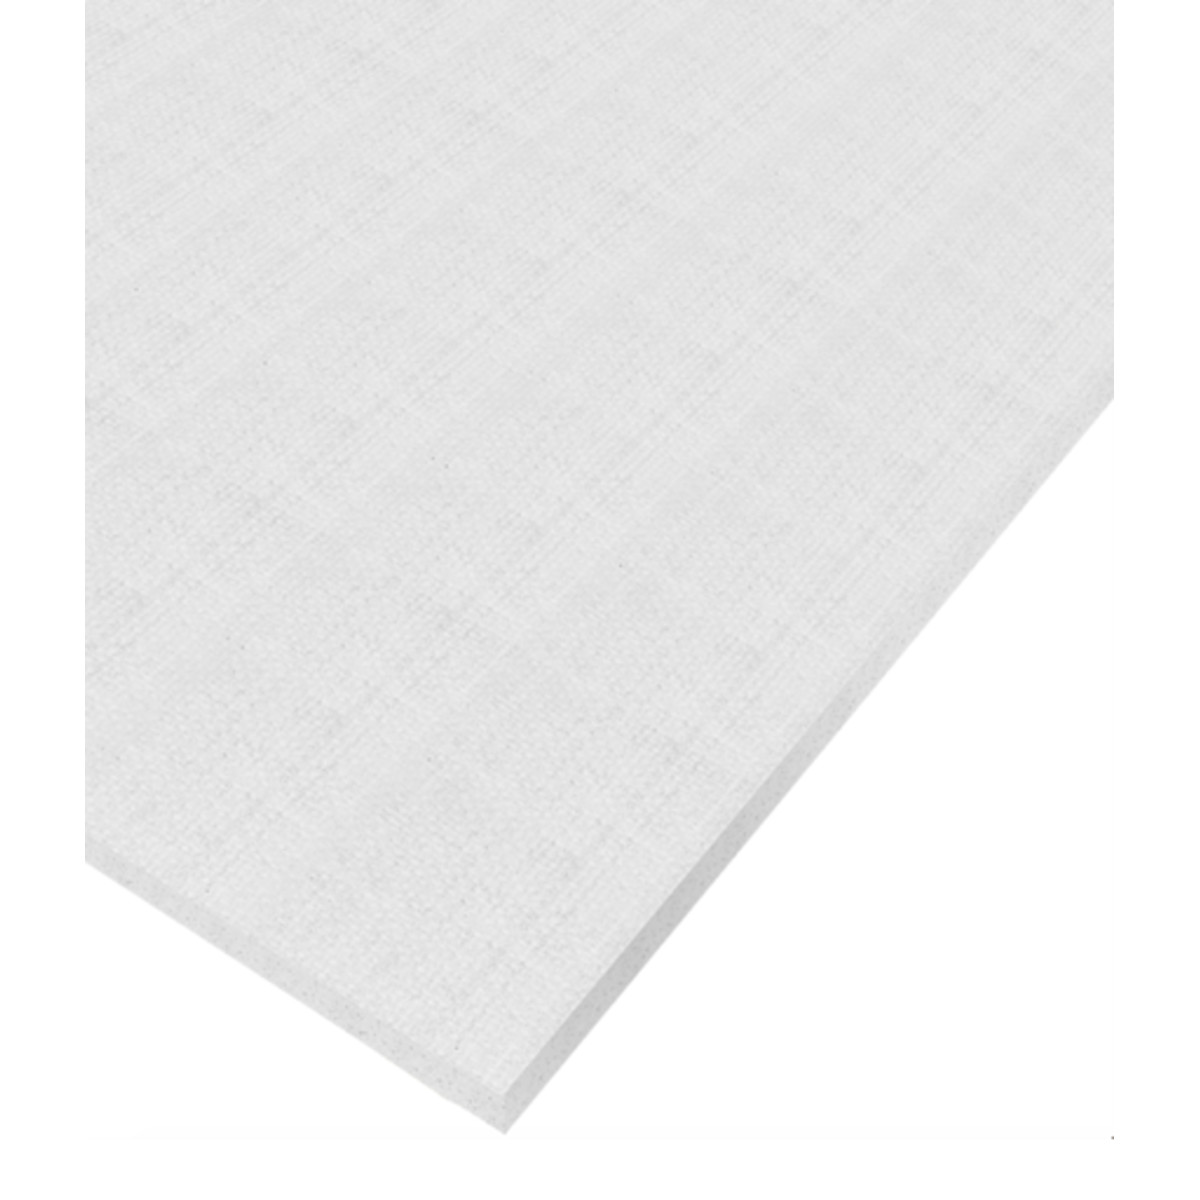 Лист стекломагниевый Magelan Премиум 2440x1220x8 мм